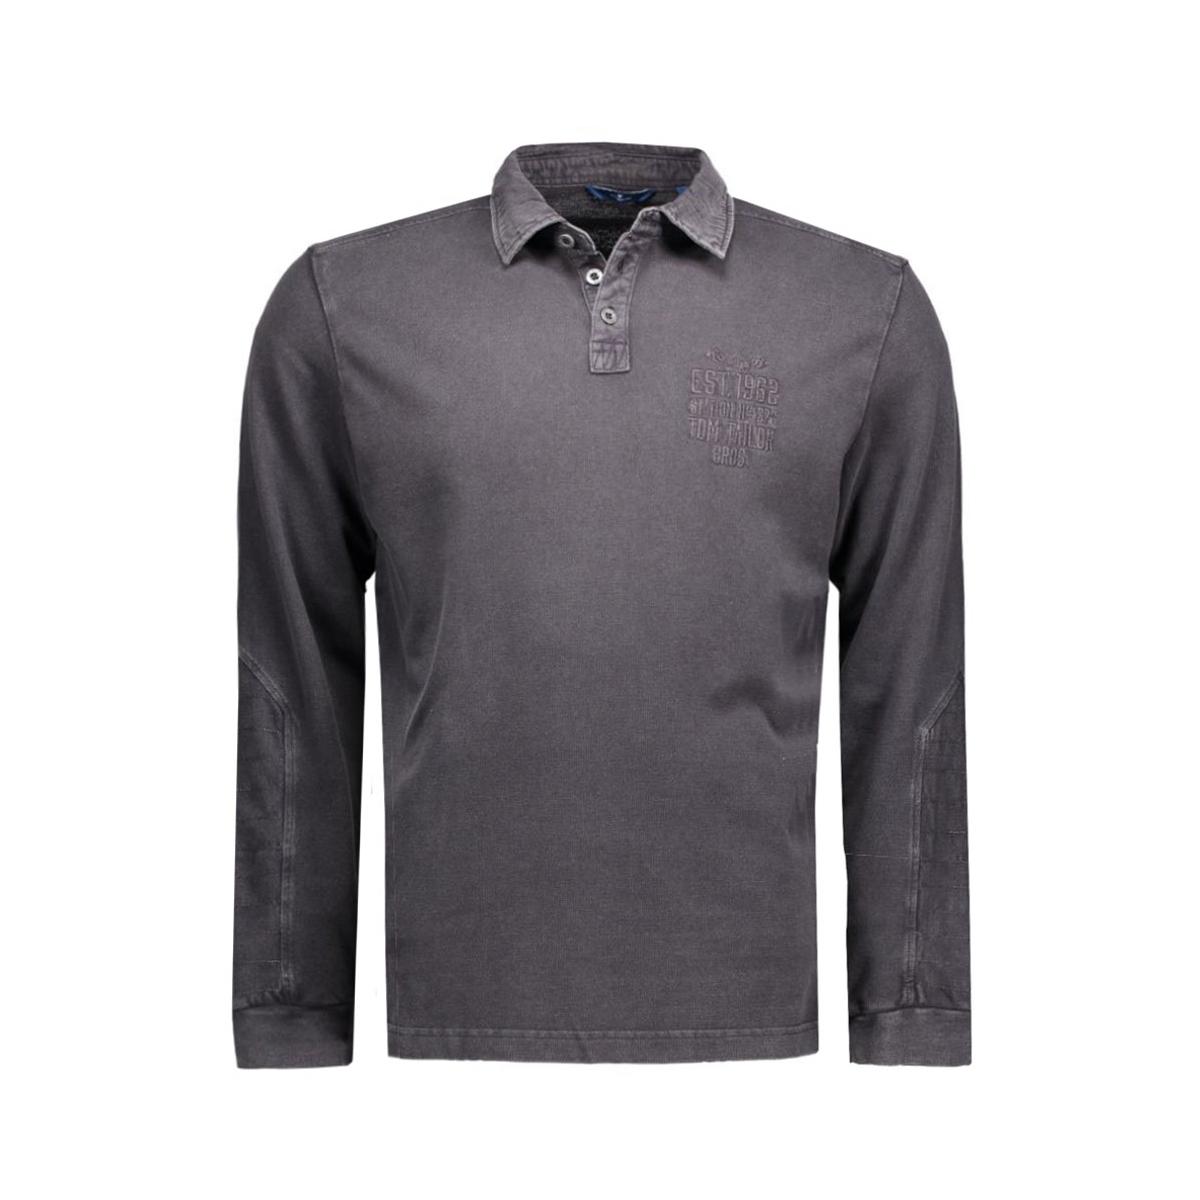 1530968.00.10 tom tailor polo 2975